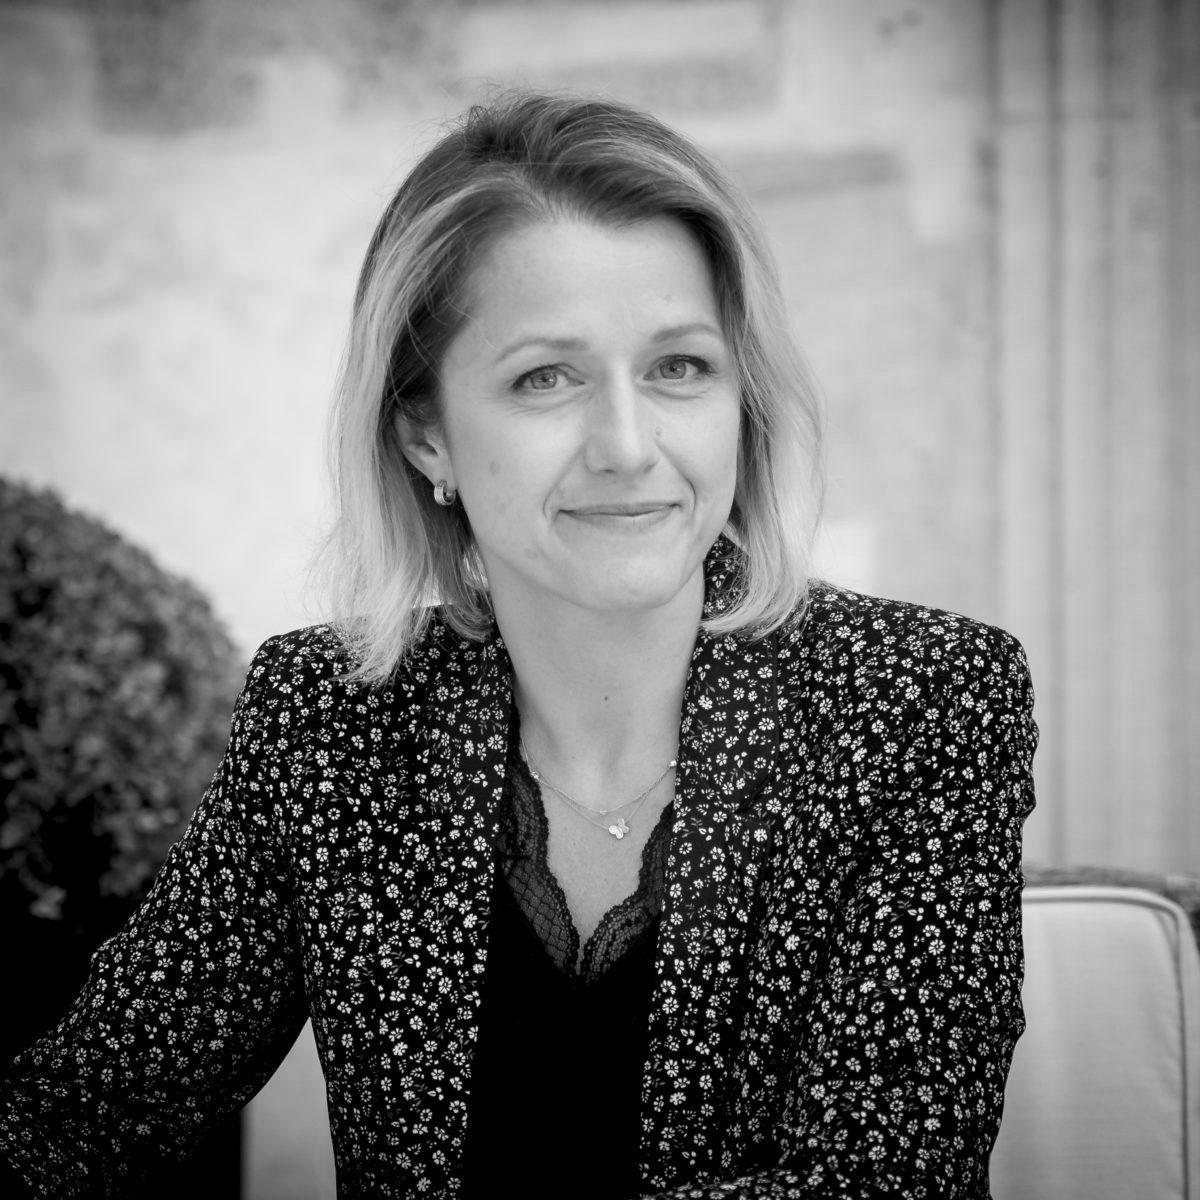 Le Grand Entretien - Barbara Pompili